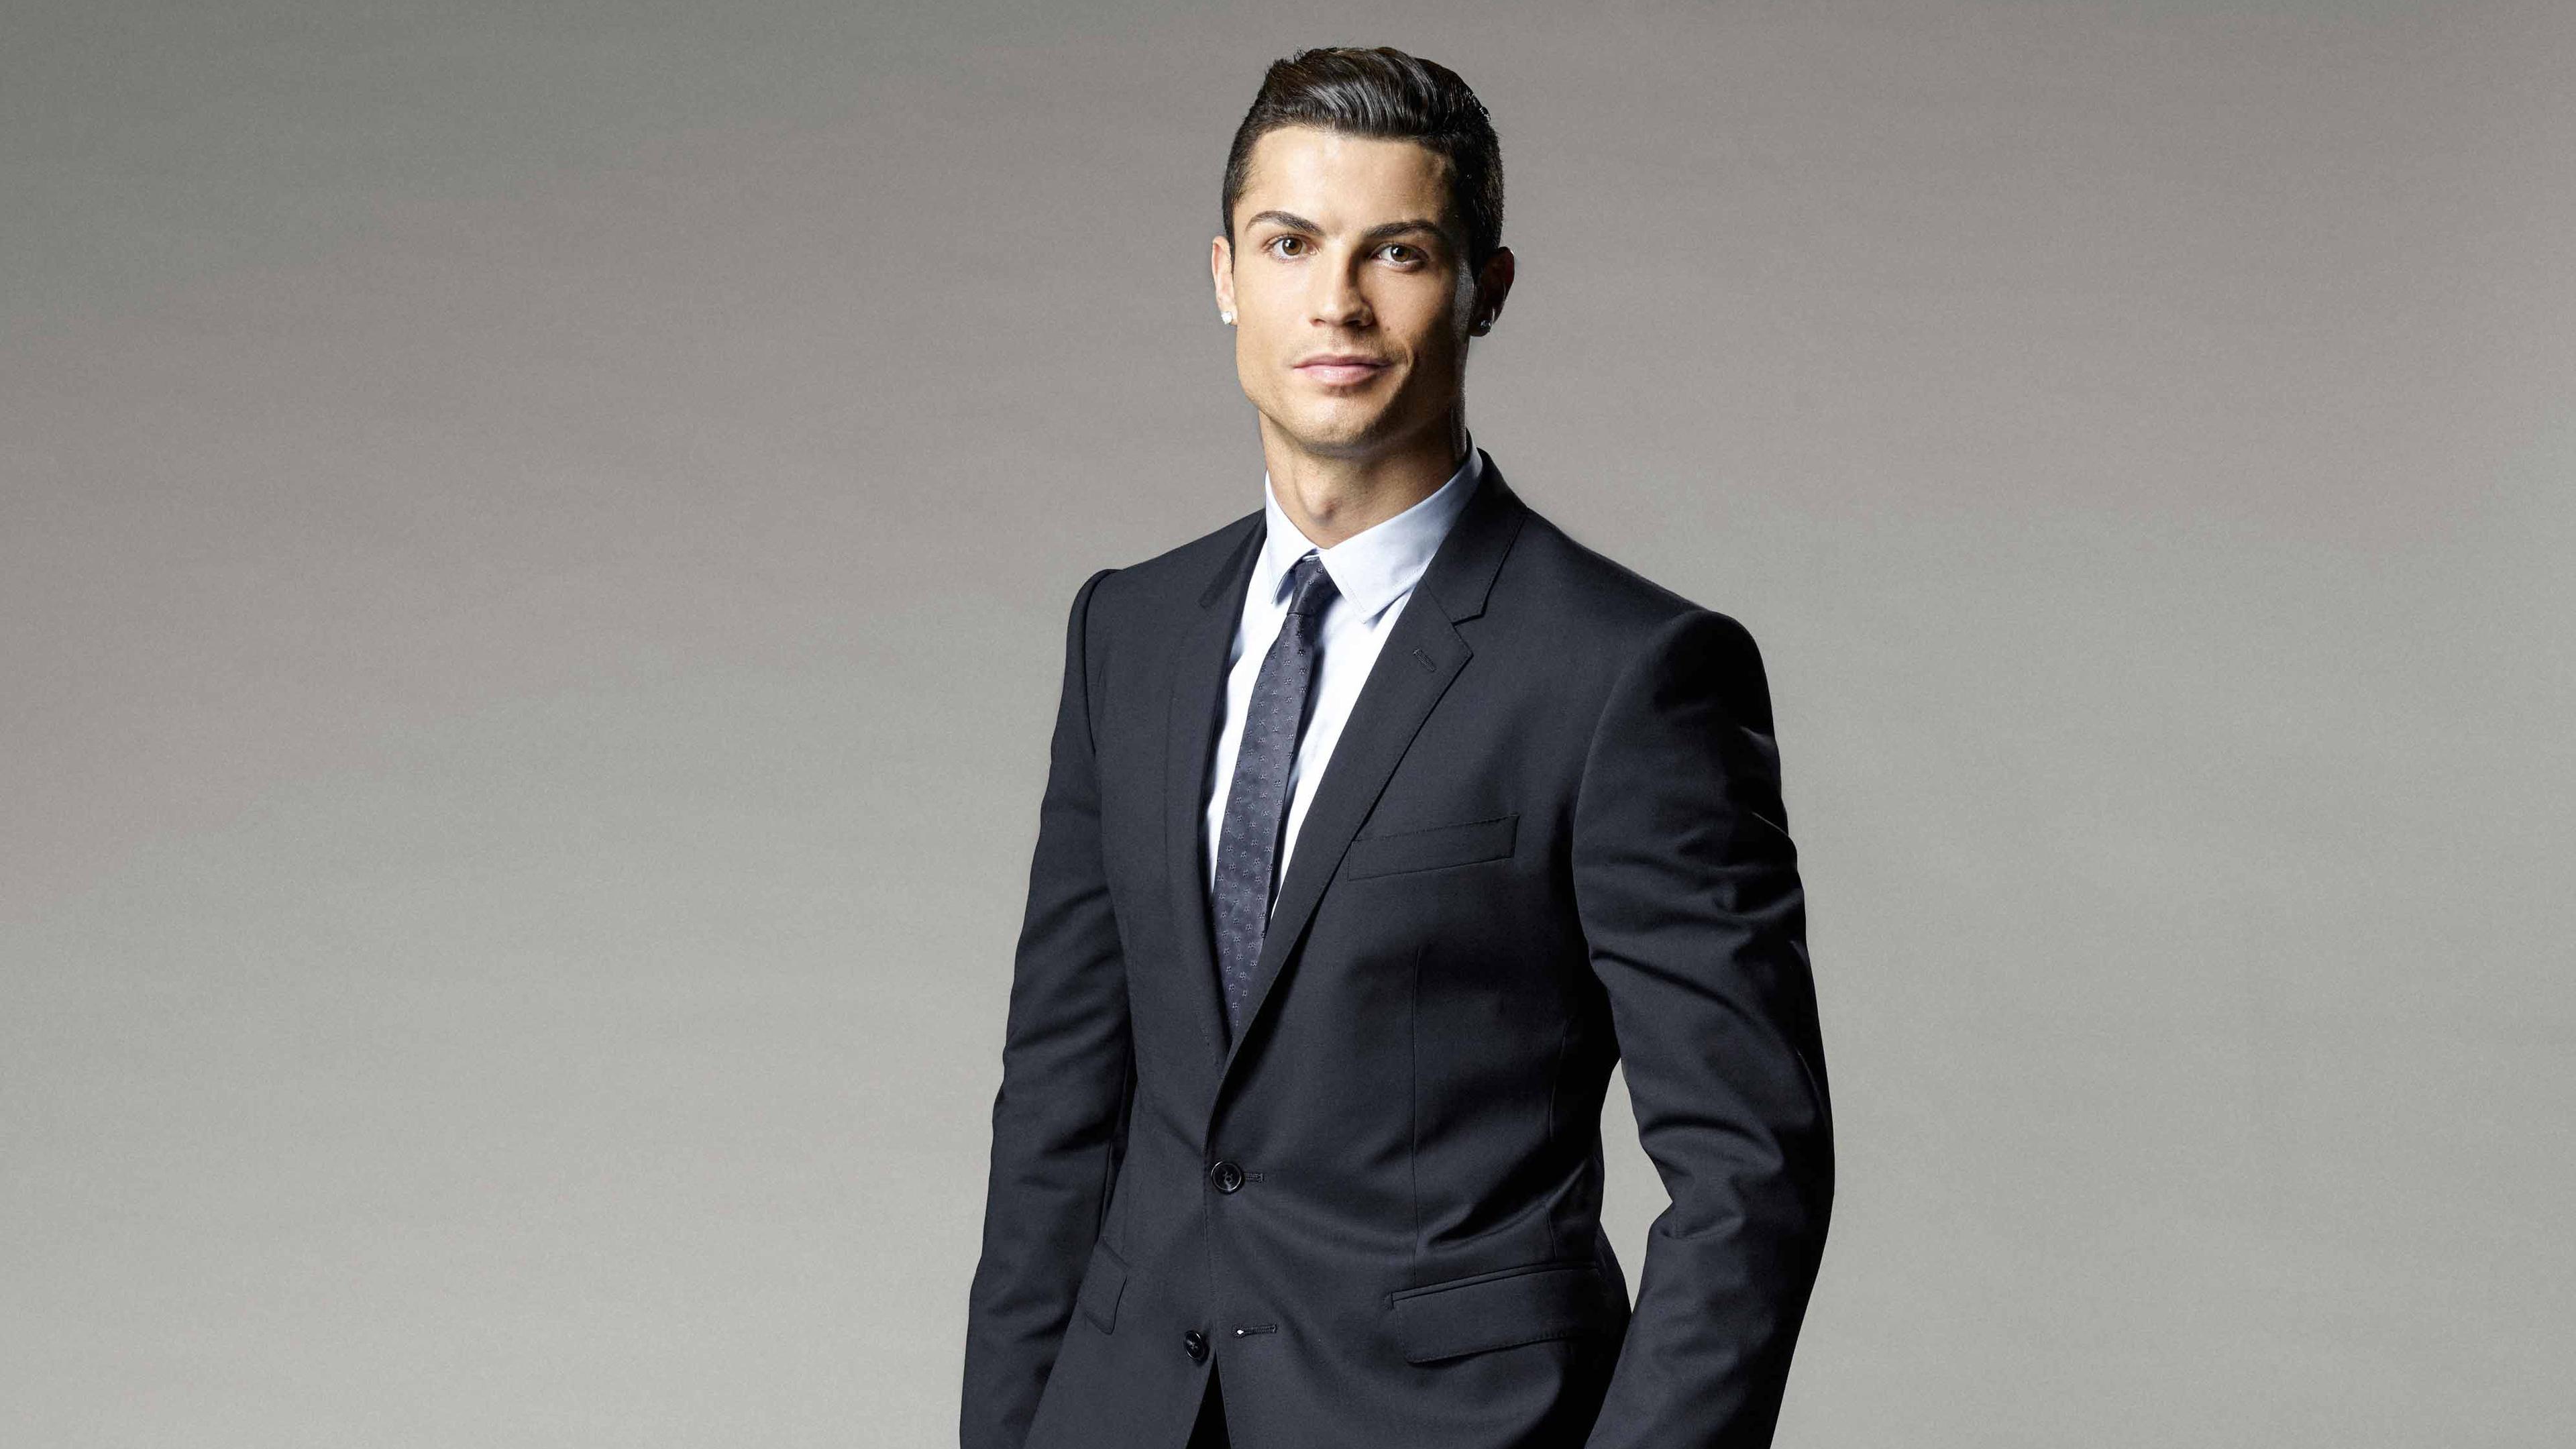 cristiano ronaldo 2019 4k 1547938844 - Cristiano Ronaldo 2019 4k - sports wallpapers, male celebrities wallpapers, hd-wallpapers, football wallpapers, cristiano ronaldo wallpapers, boys wallpapers, 4k-wallpapers